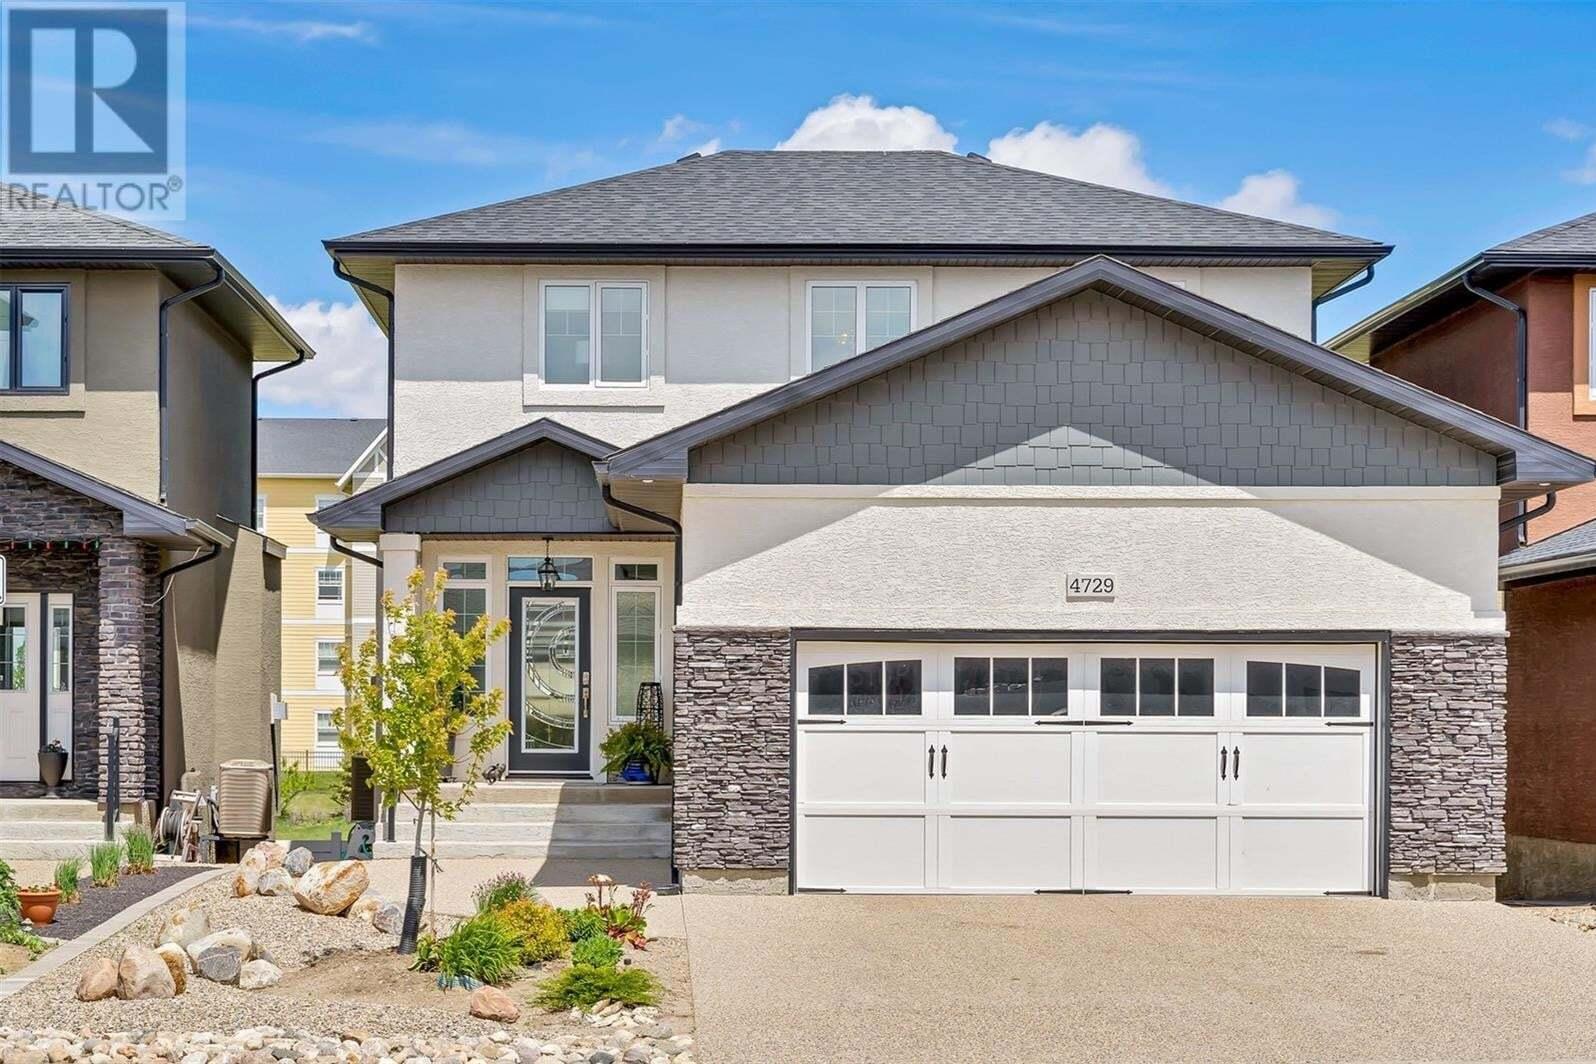 House for sale at 4729 Skinner Cres Regina Saskatchewan - MLS: SK811026